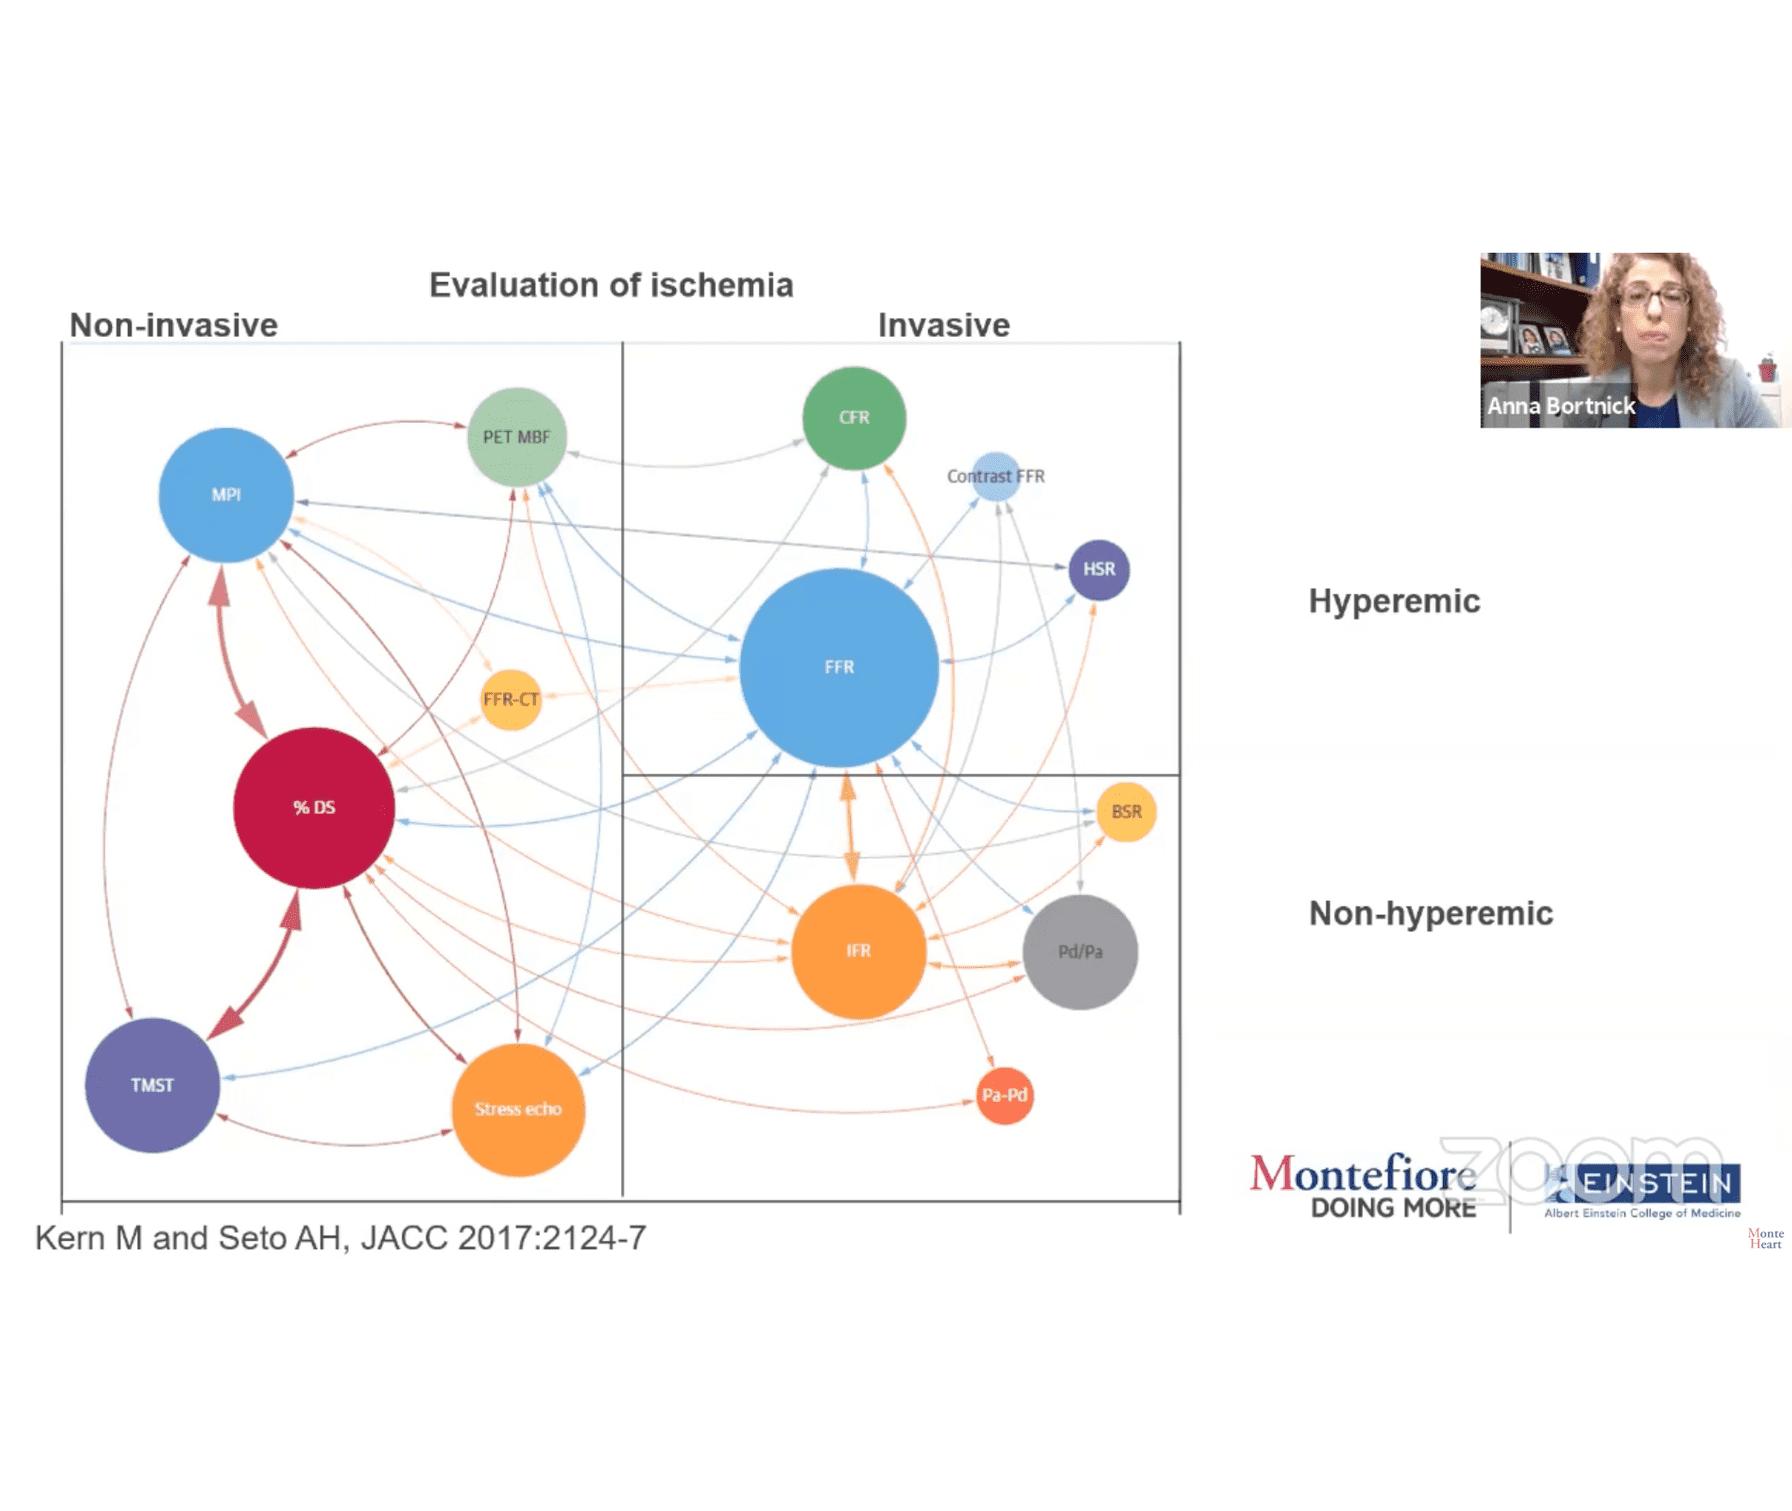 Montefiore-Einstein Cardiology organizes more than 80 global conferences